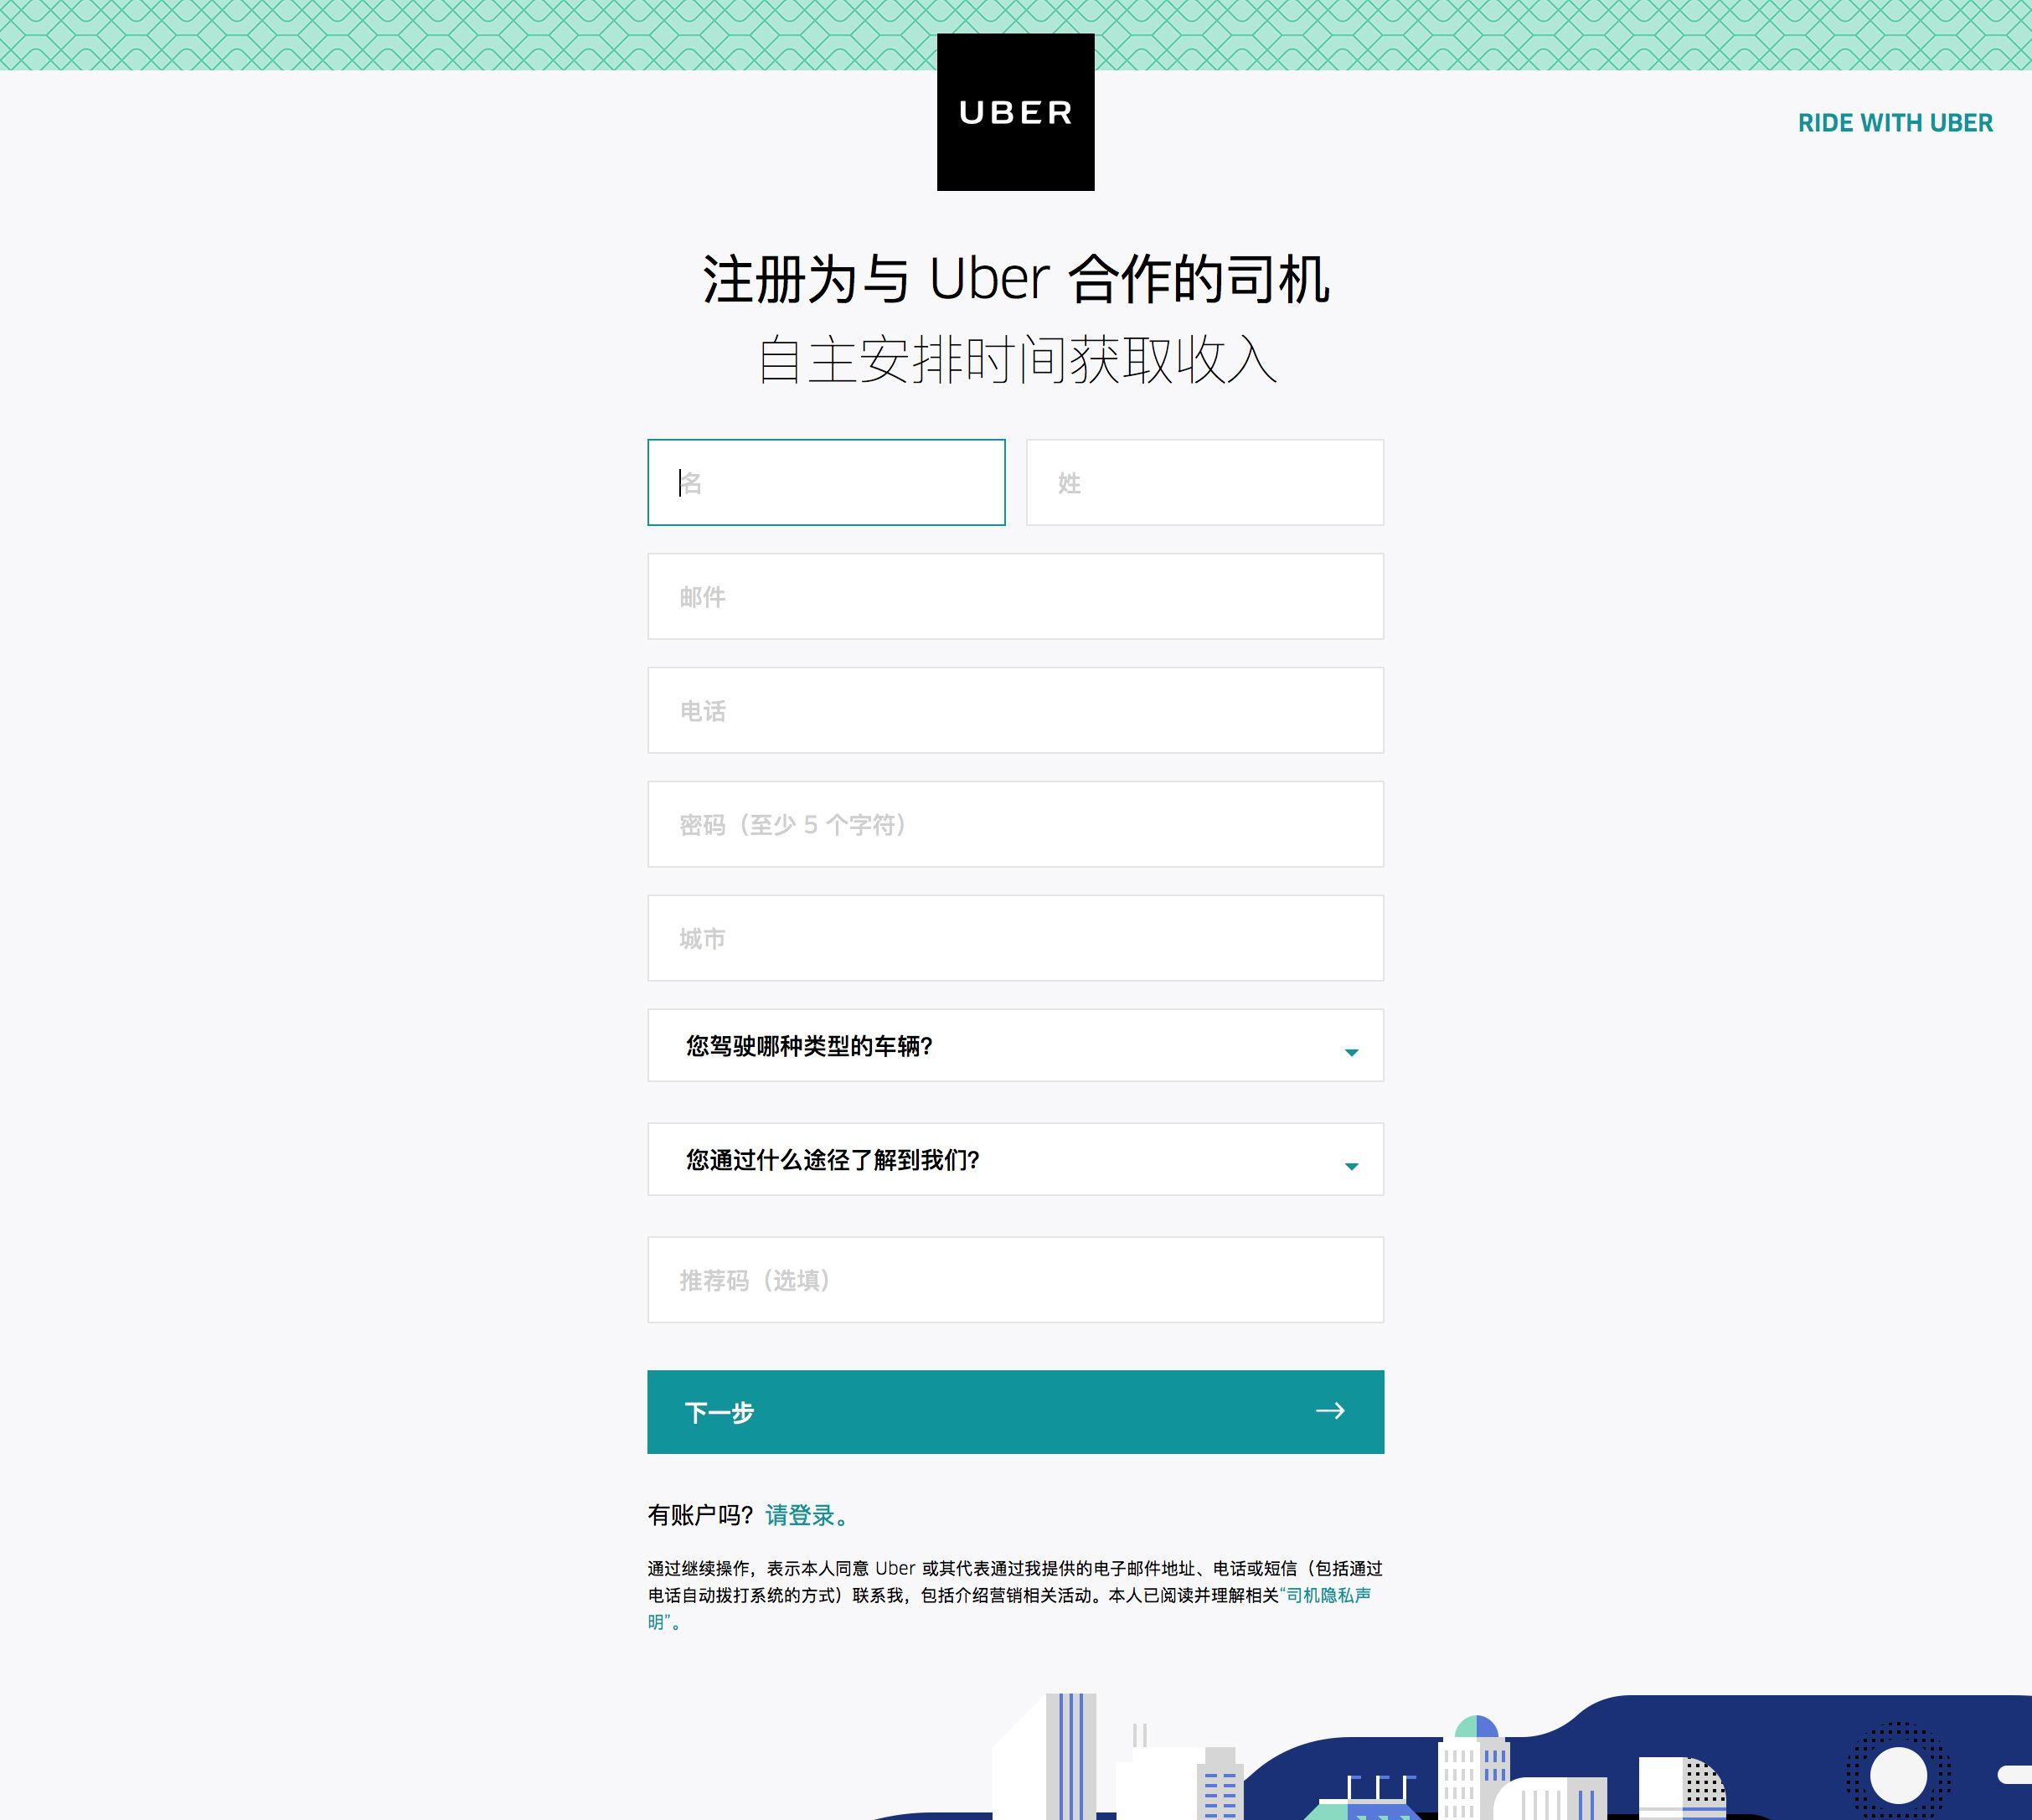 Uber - Log in | UI - Log in | Uber driving, Uber, Diagram